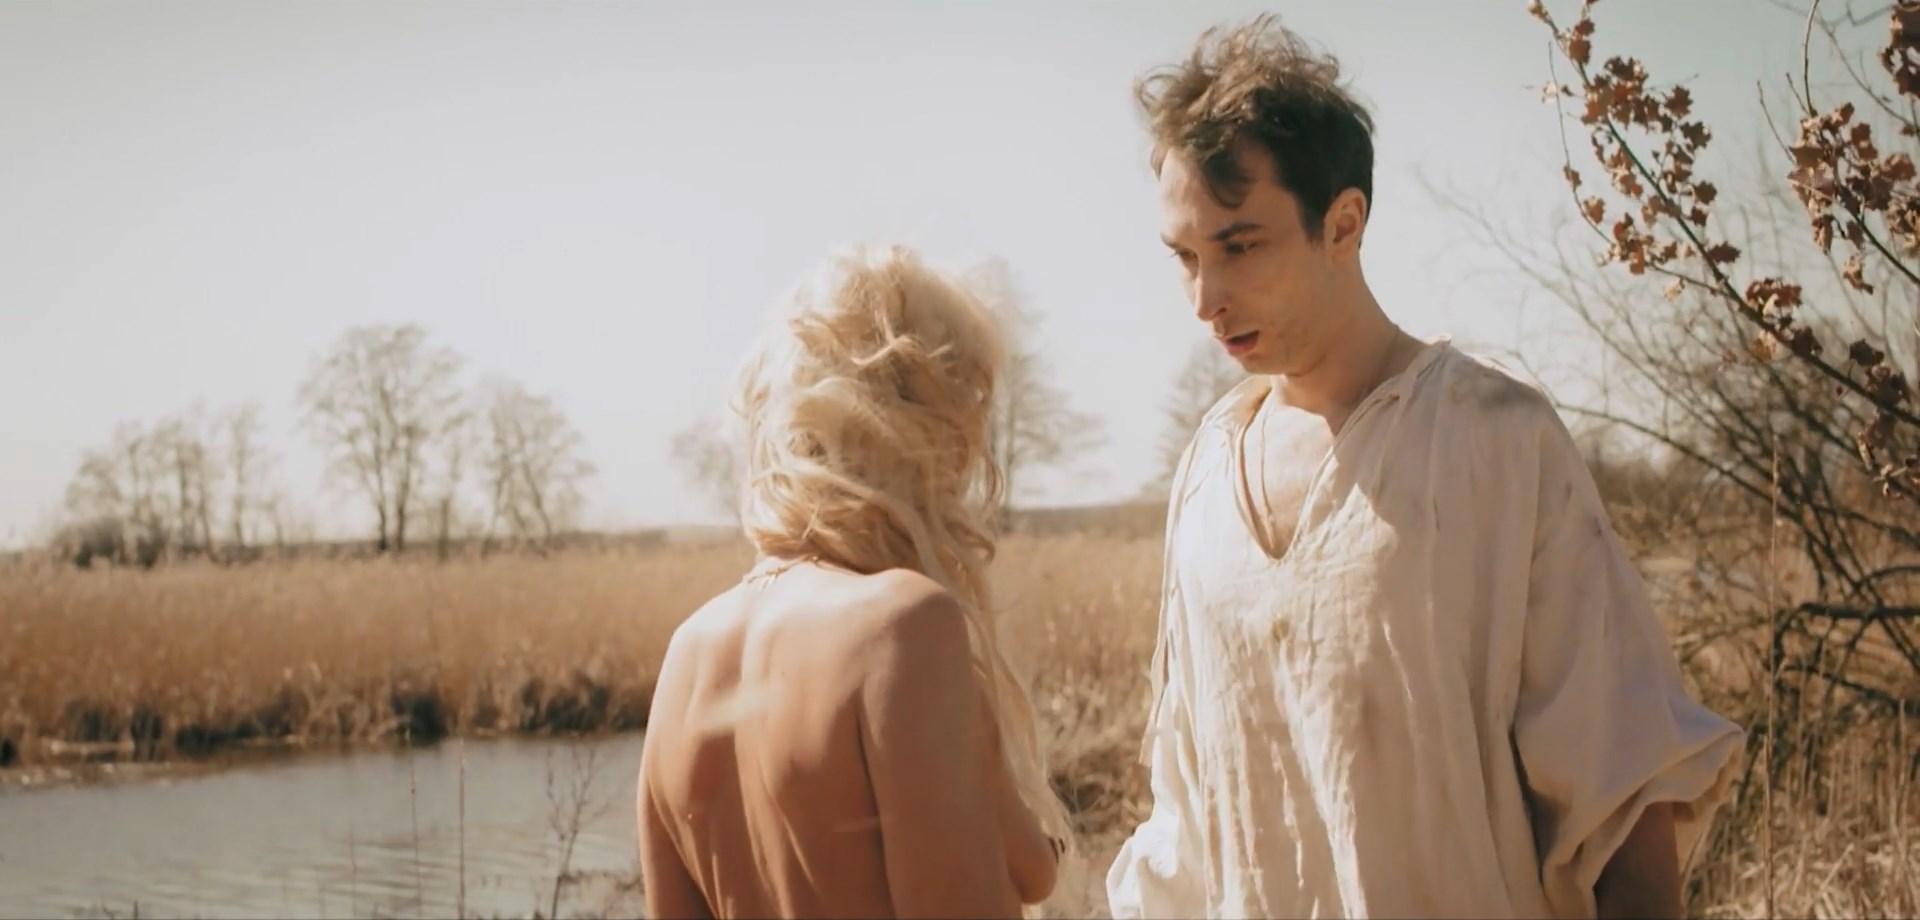 Izabella Podobinska nude - Erotyk (2018)